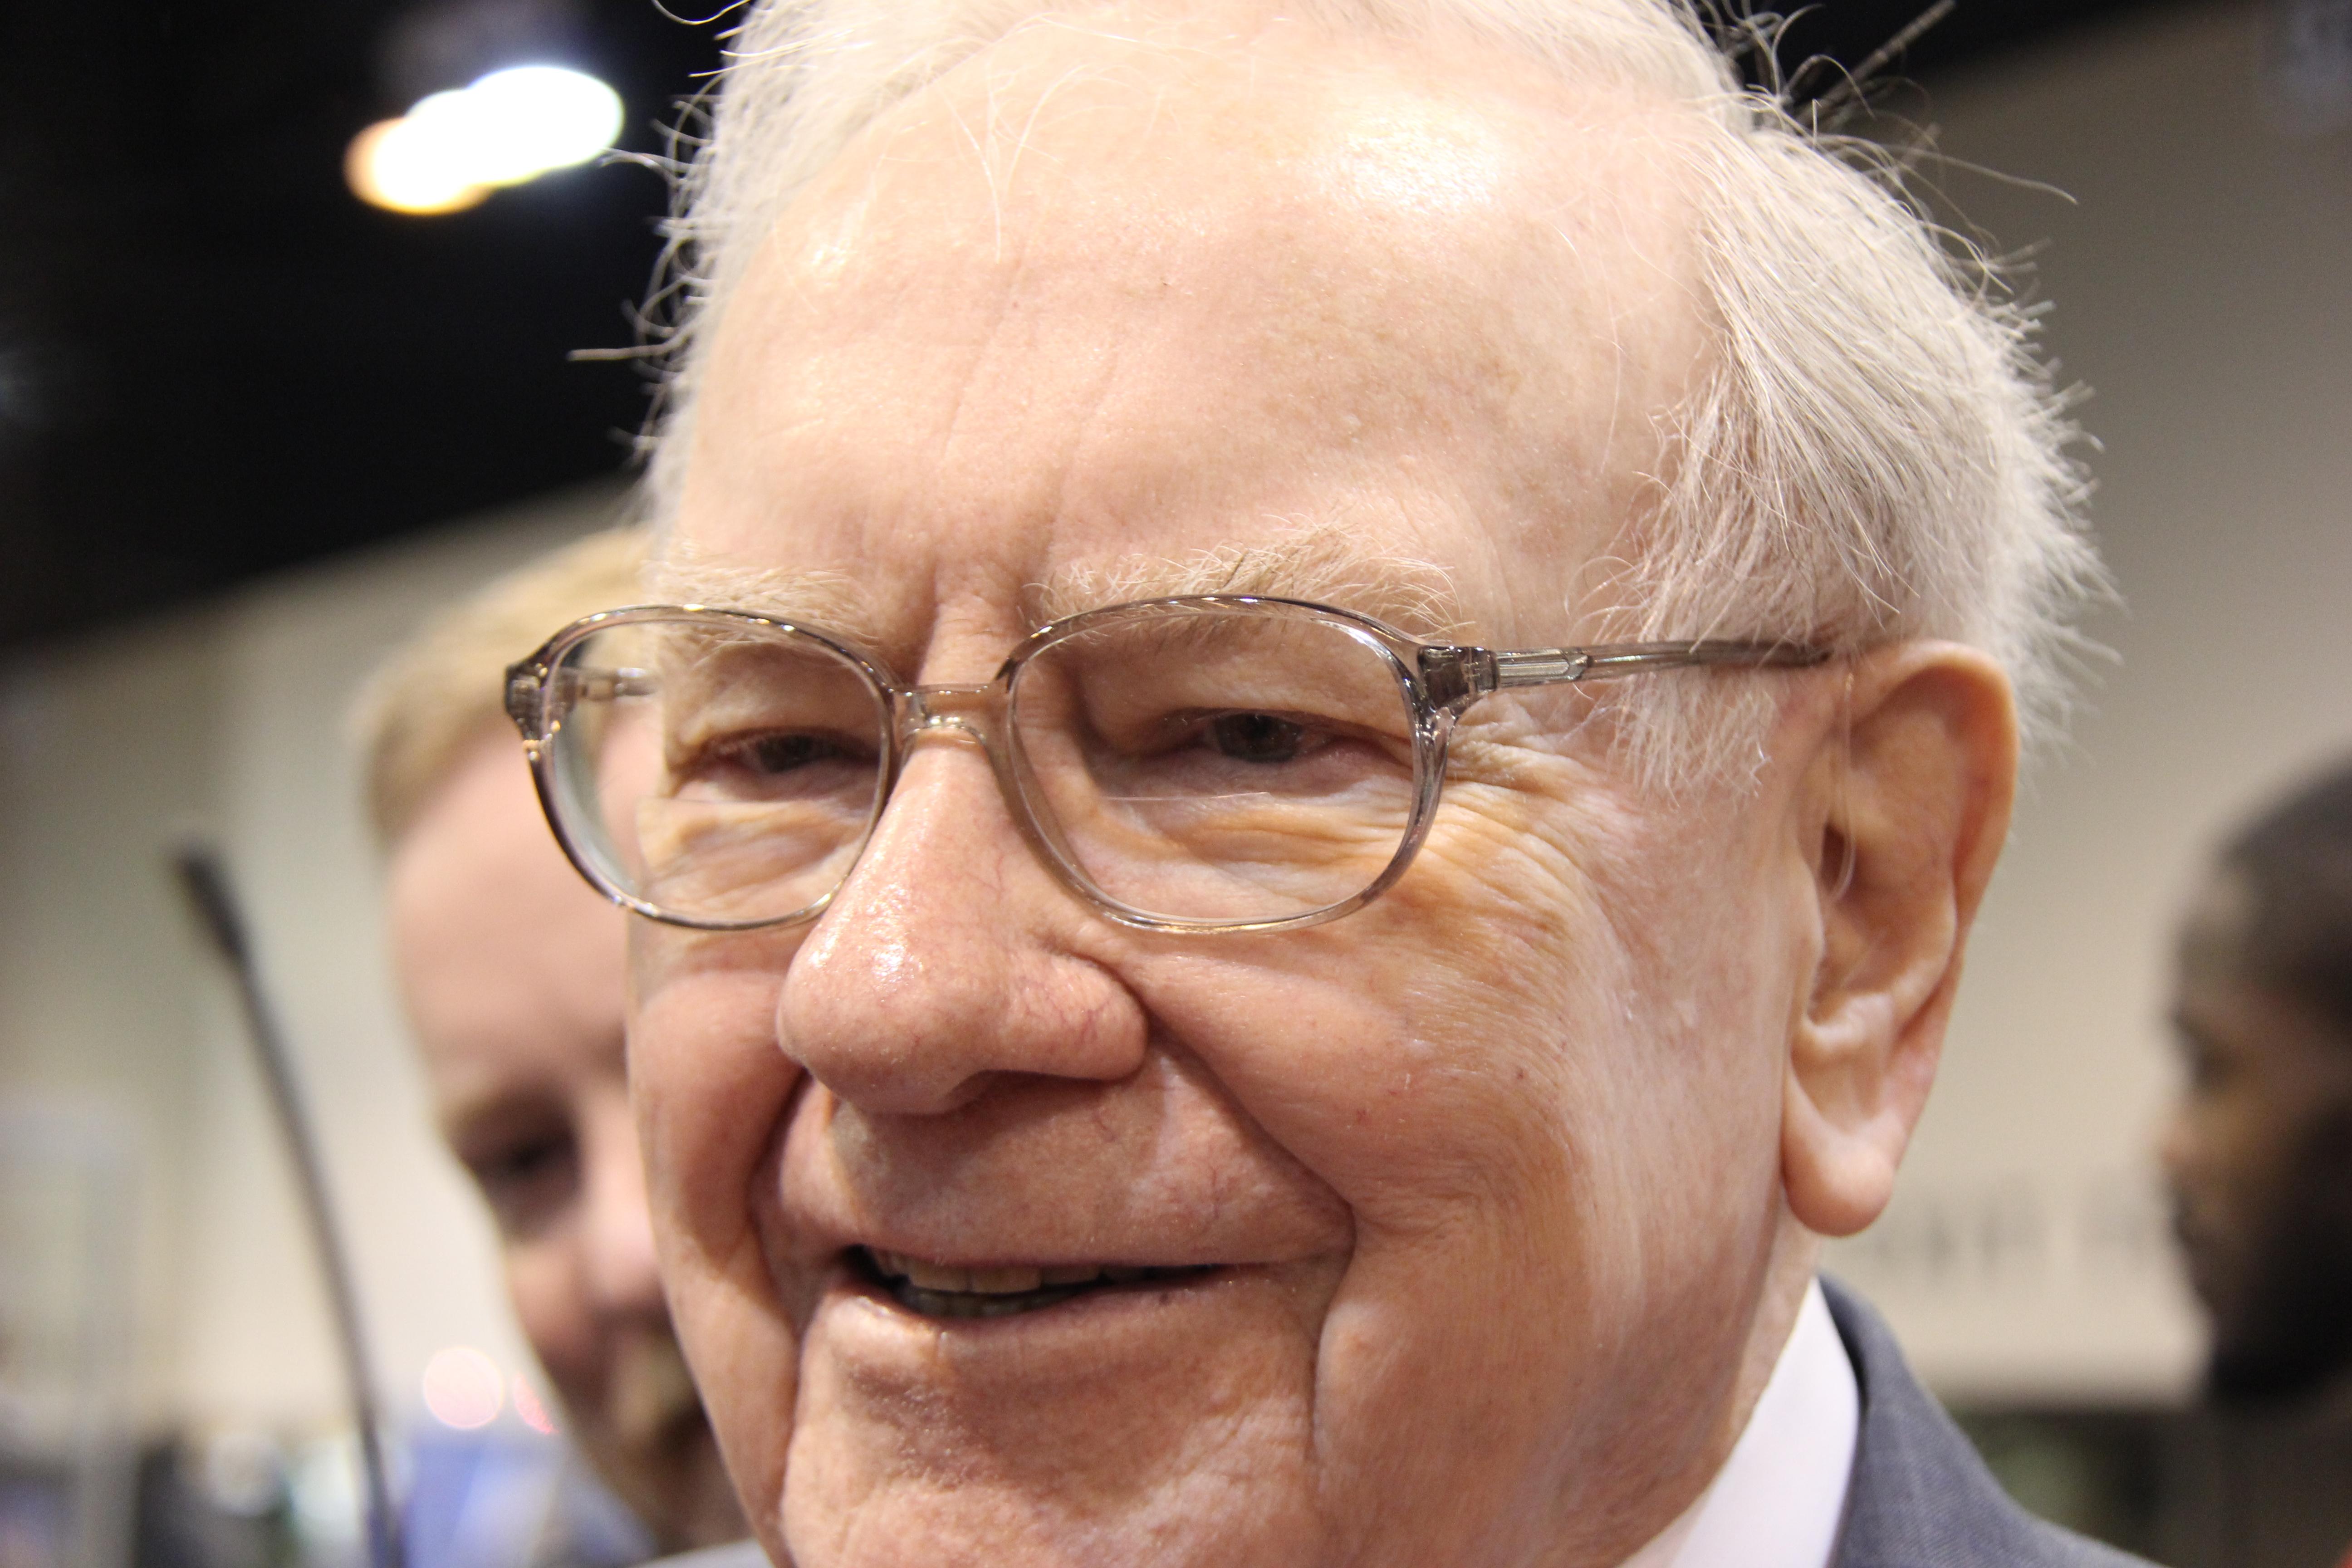 Headshot of Warren Buffett walking through a crowd.